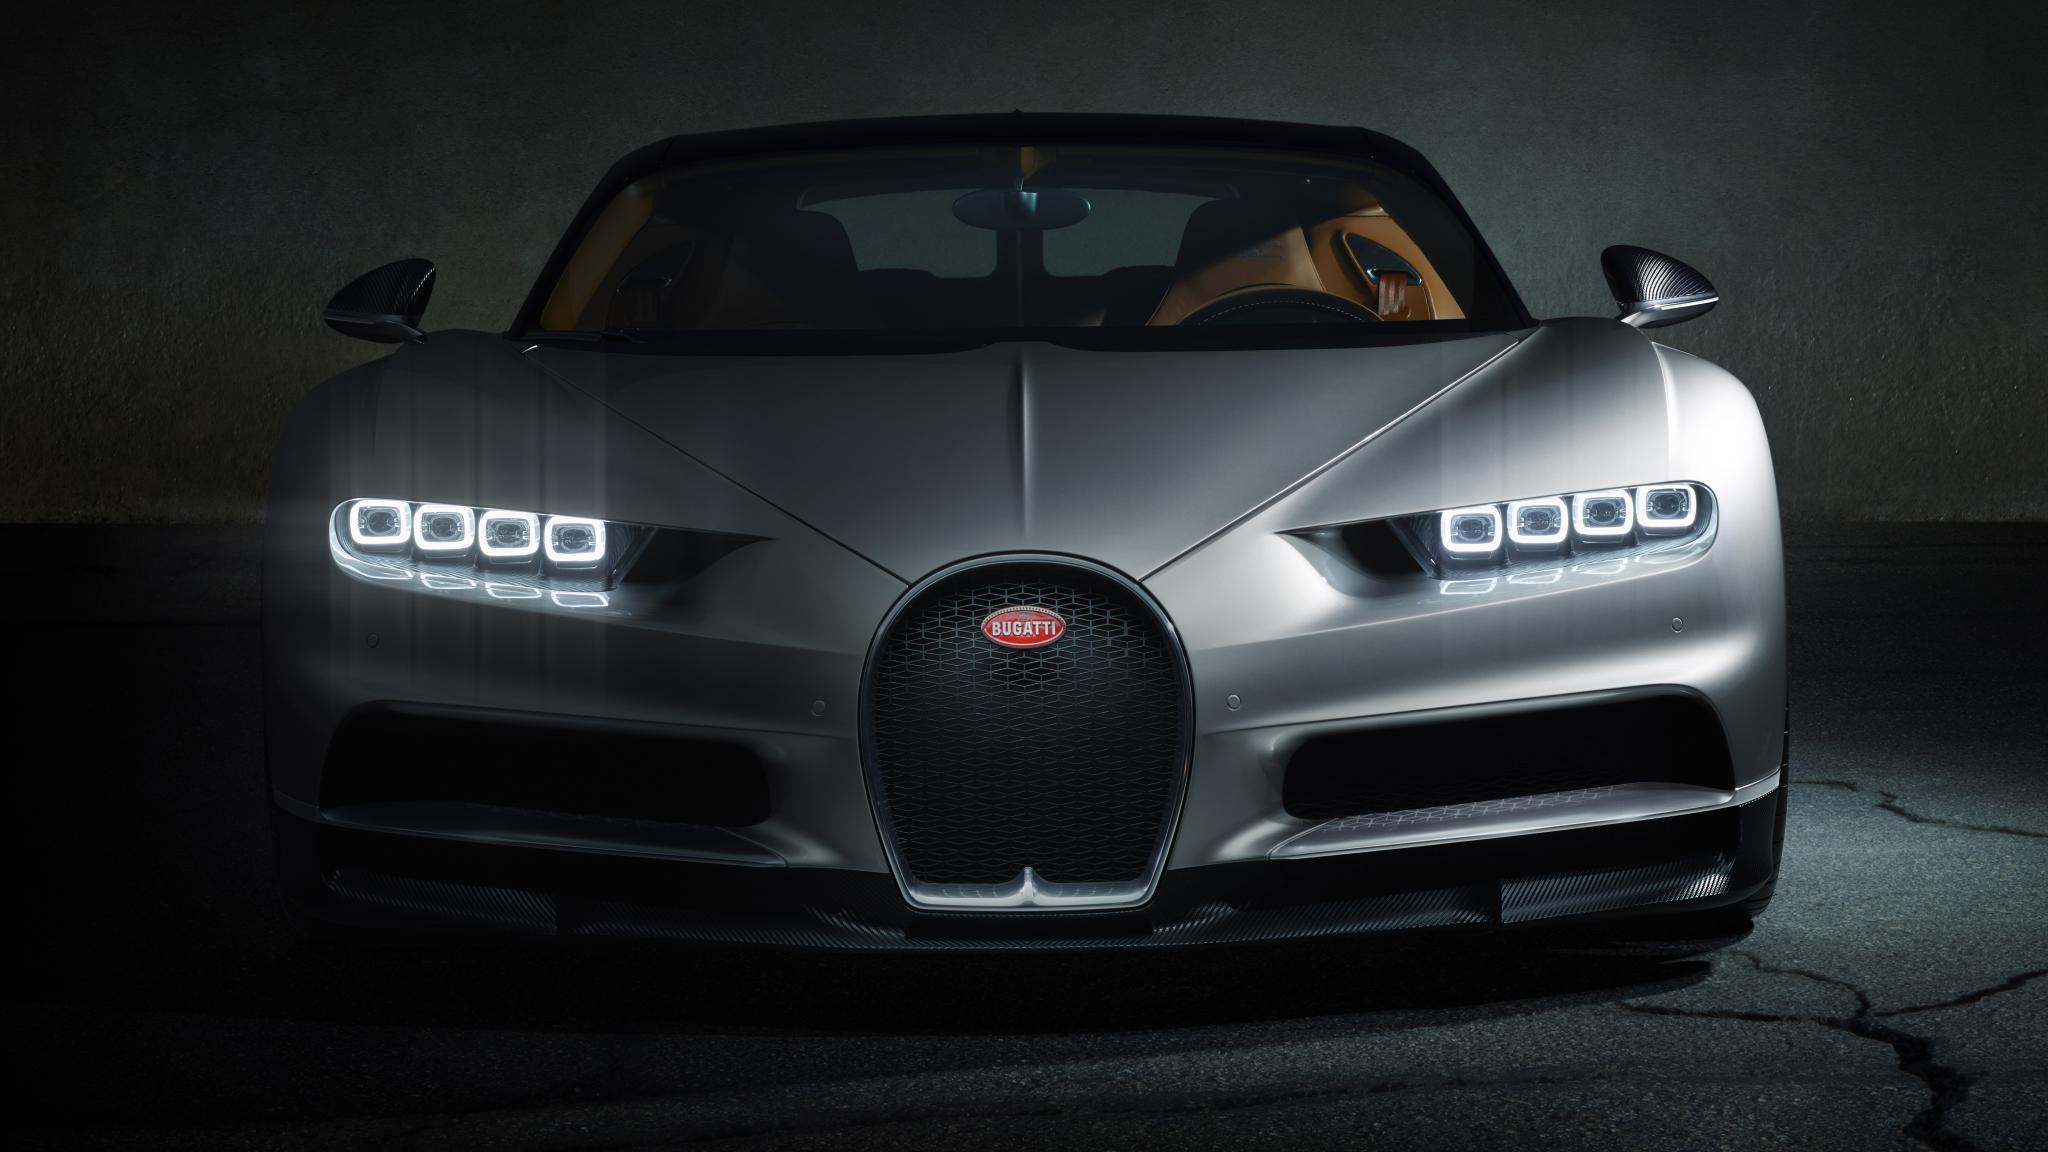 Officieel Dit Is De Bugatti Chiron Hartvoorautos Nl